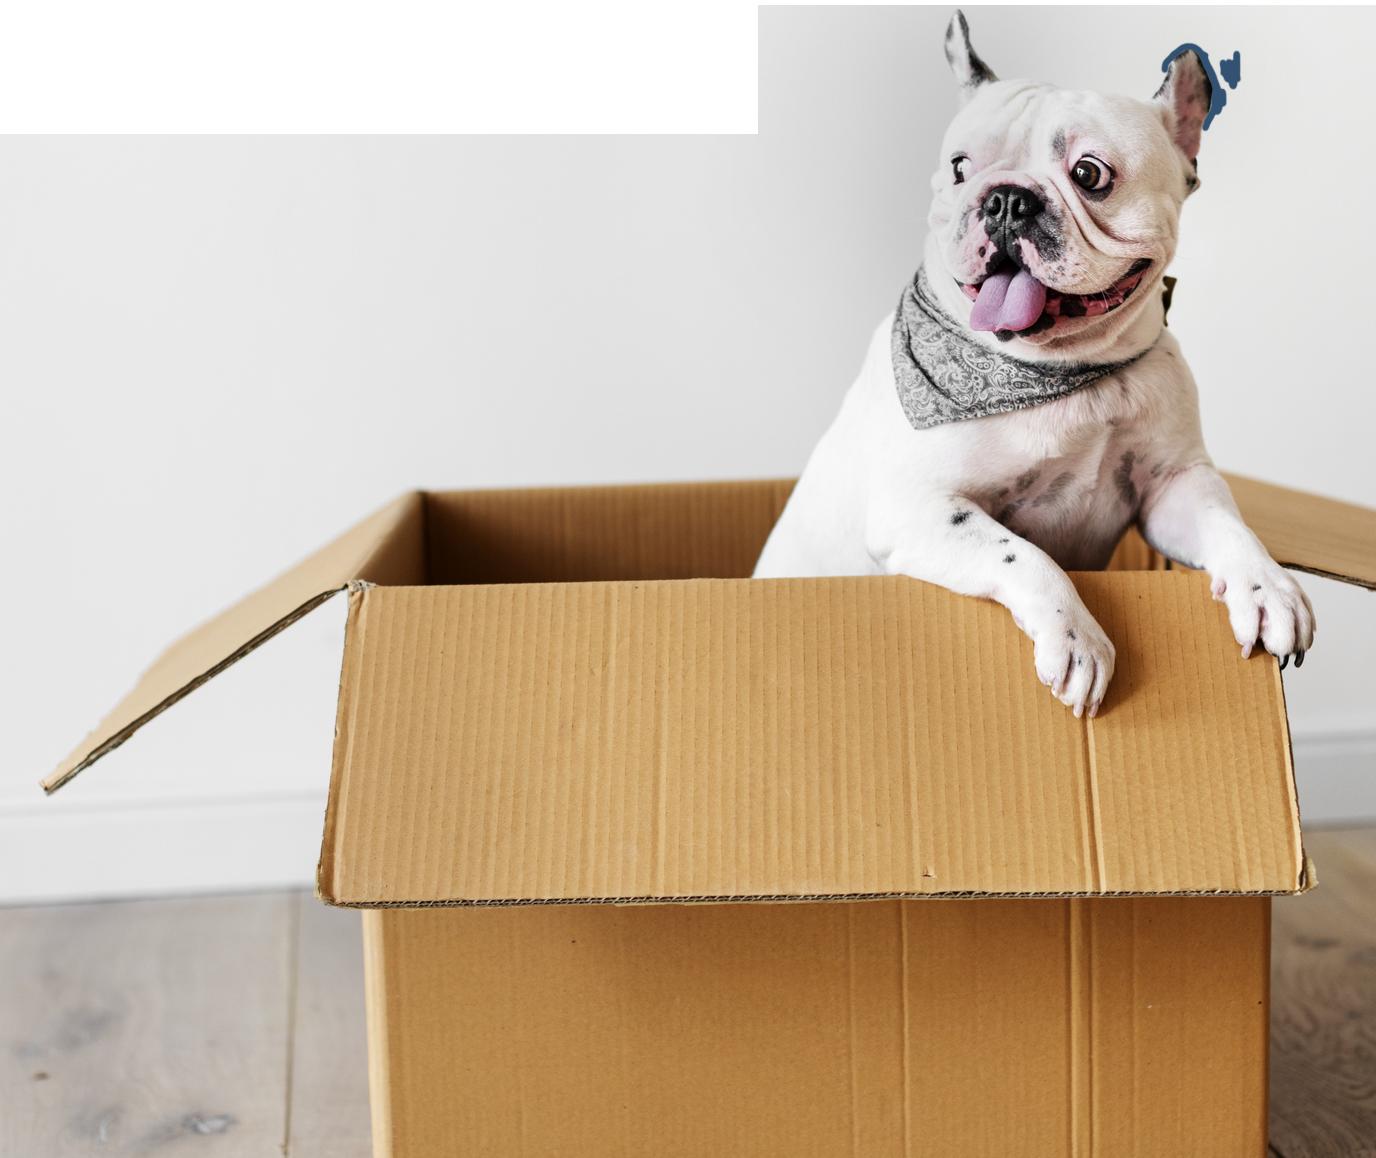 bulldog in box